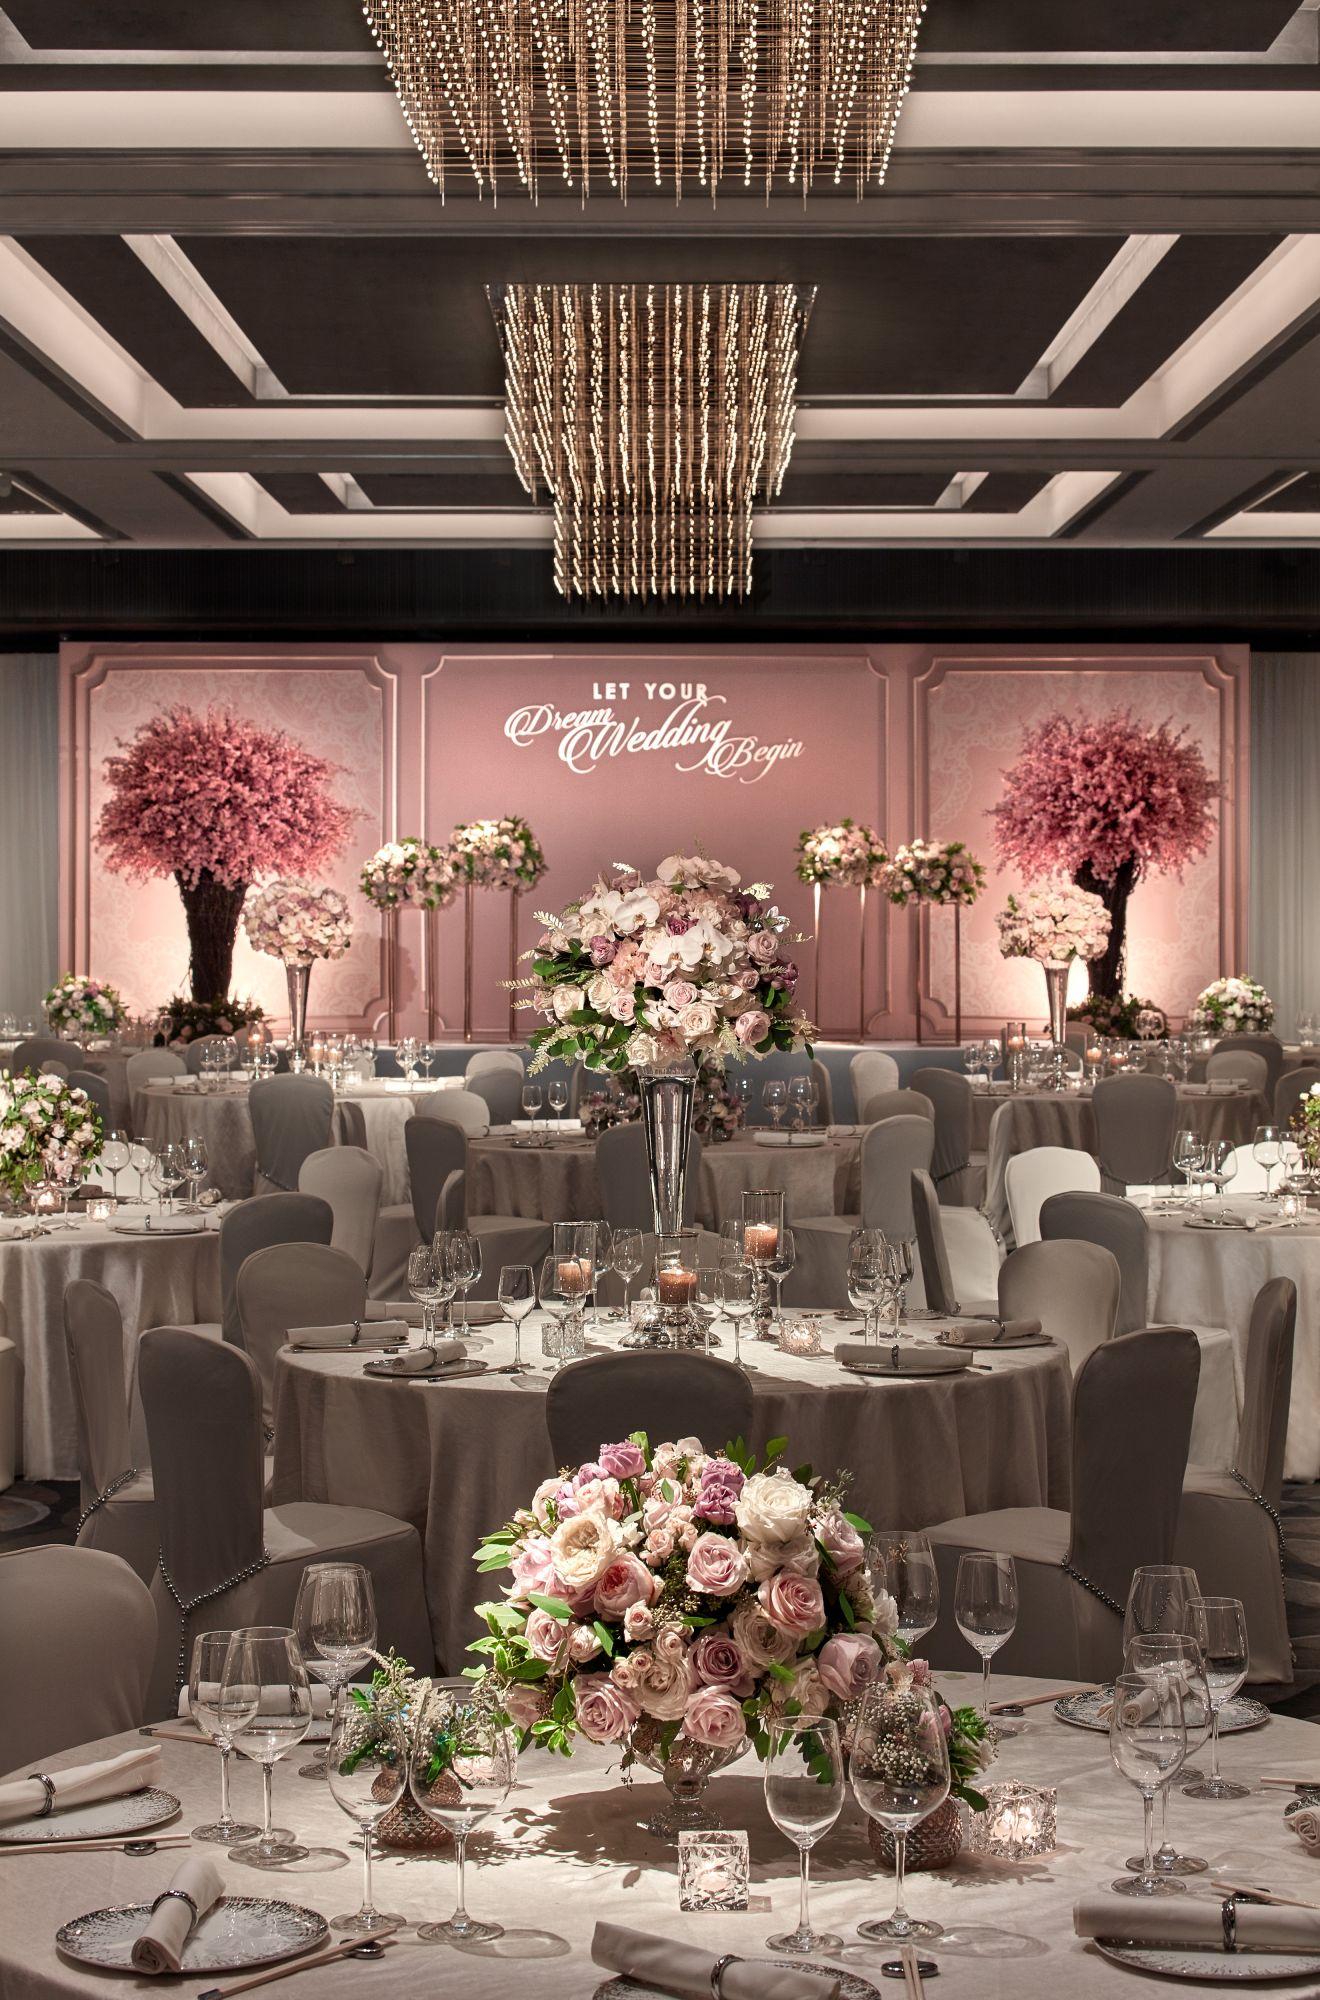 Photo Courtesy Of Jw Marriott Hotel Hong Kong